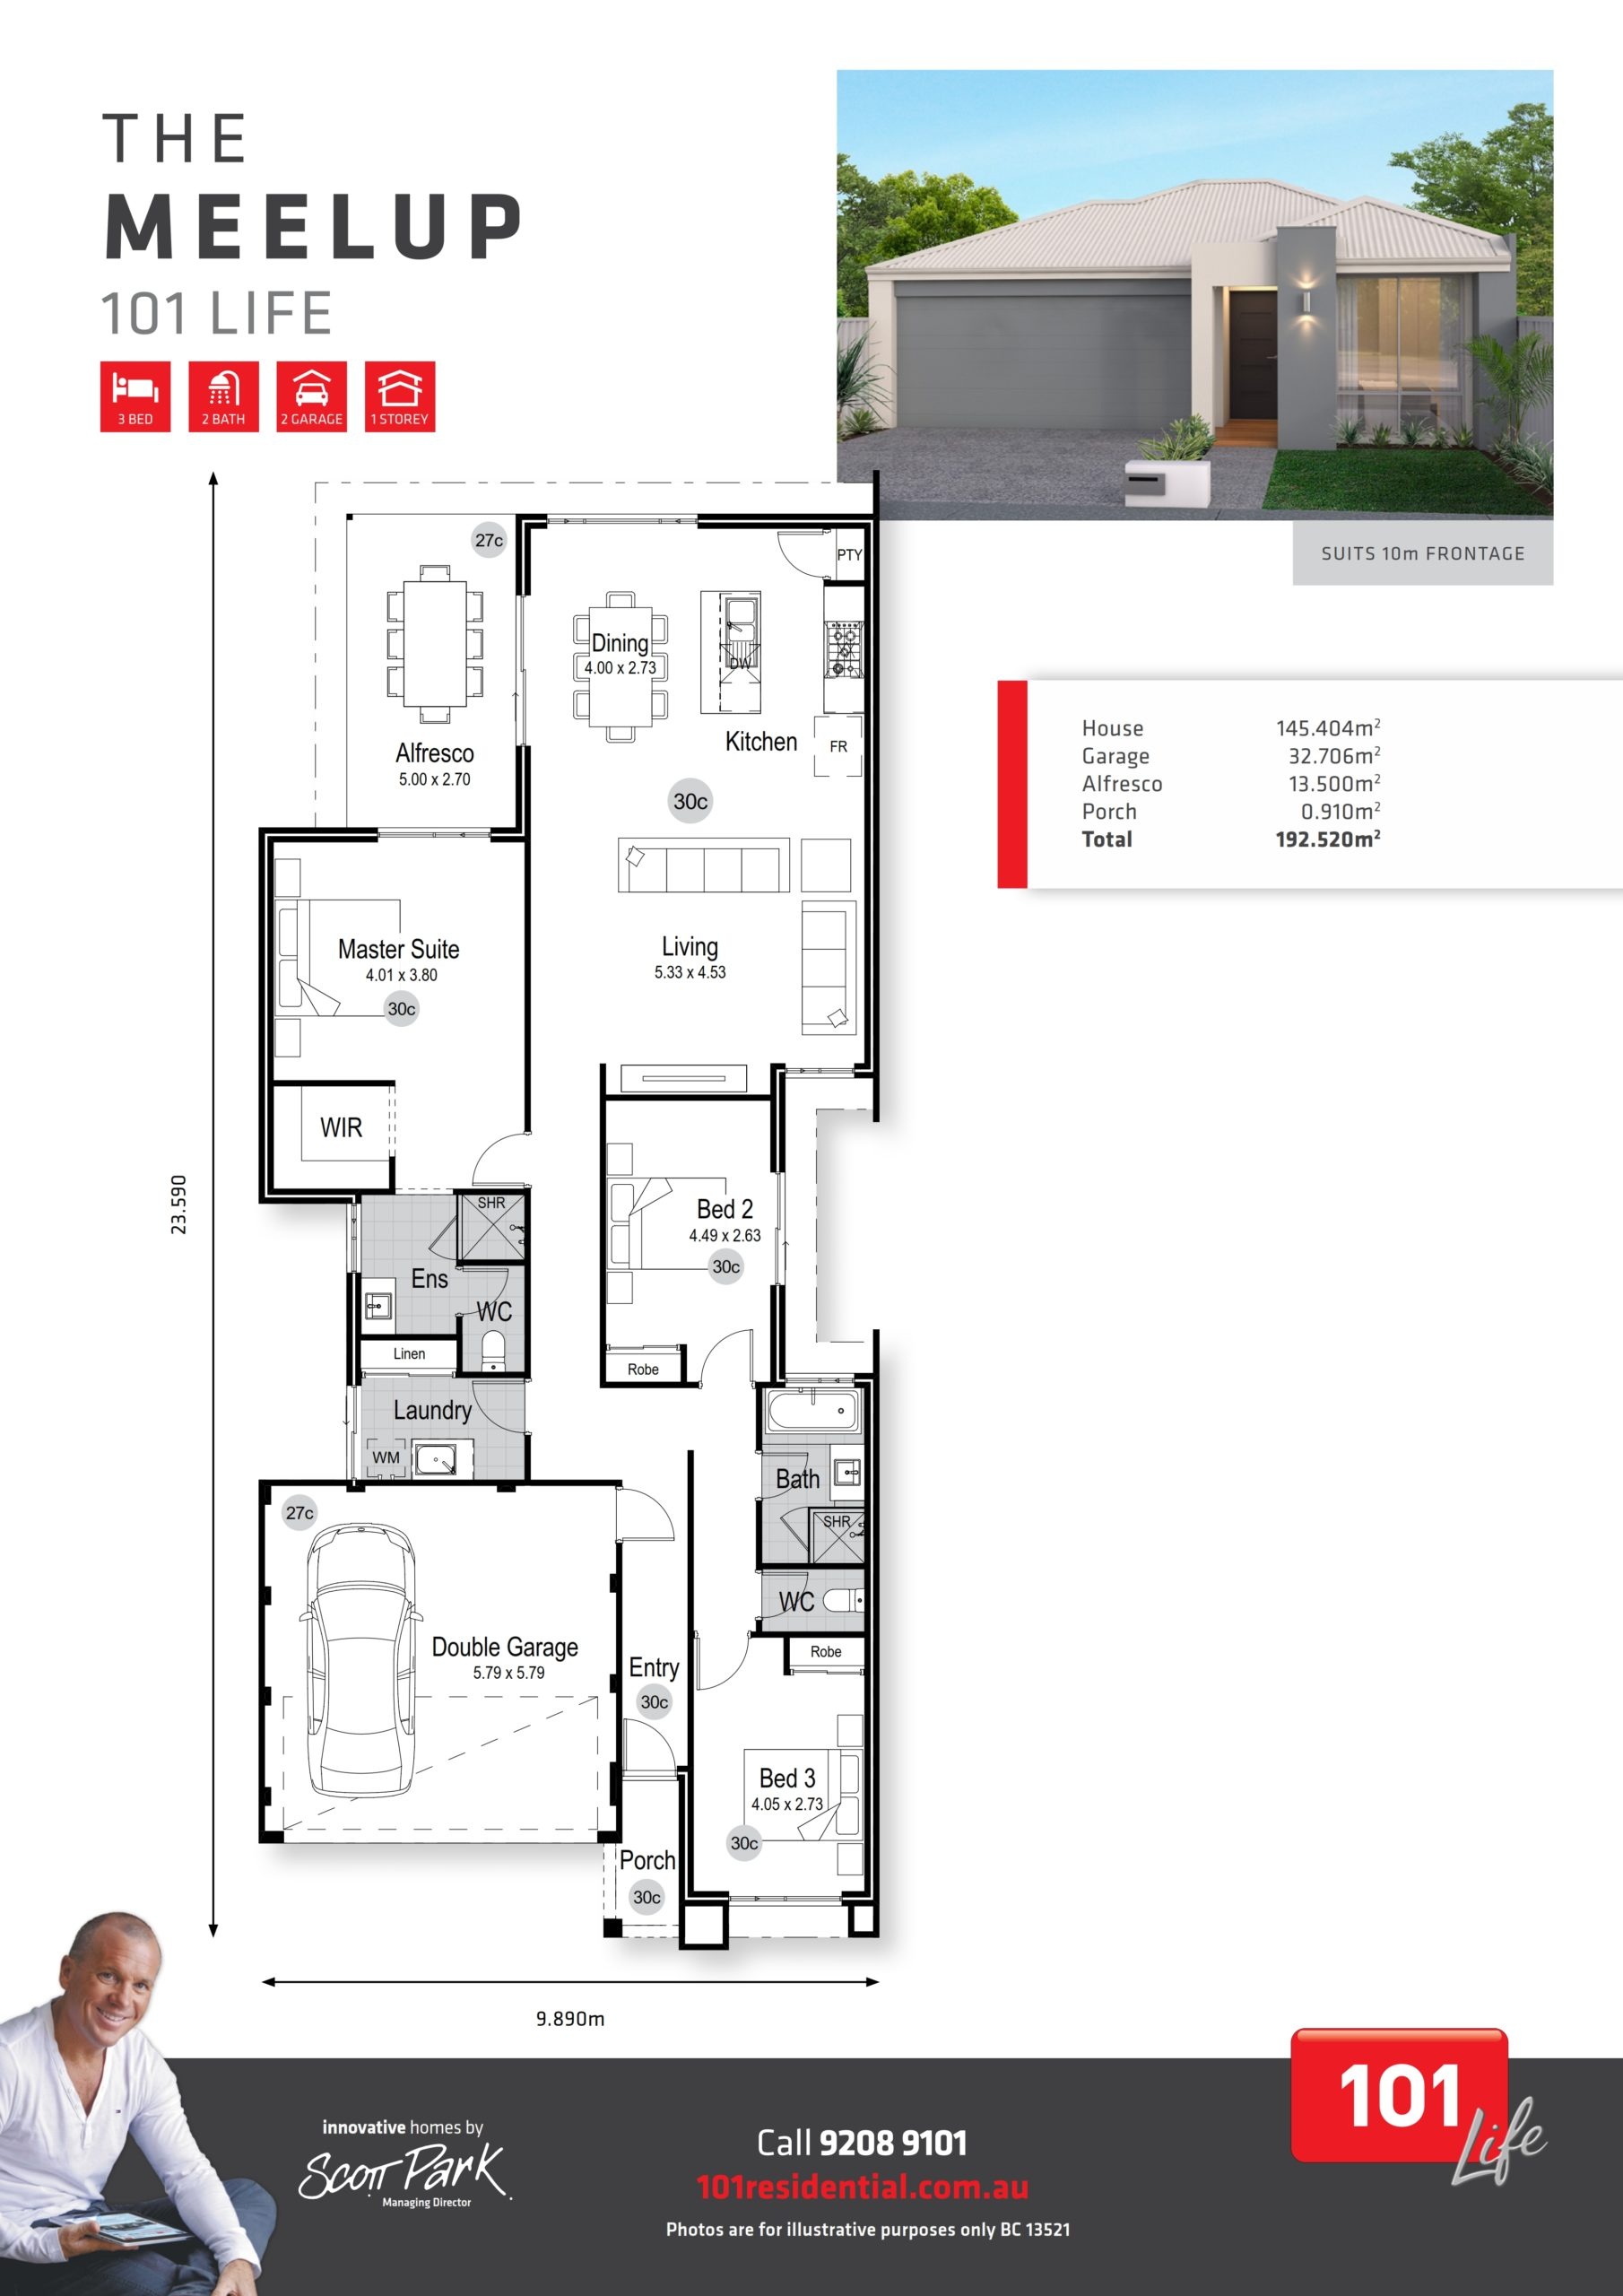 101 Life A3 Floor Plan - Meelup WEB_001